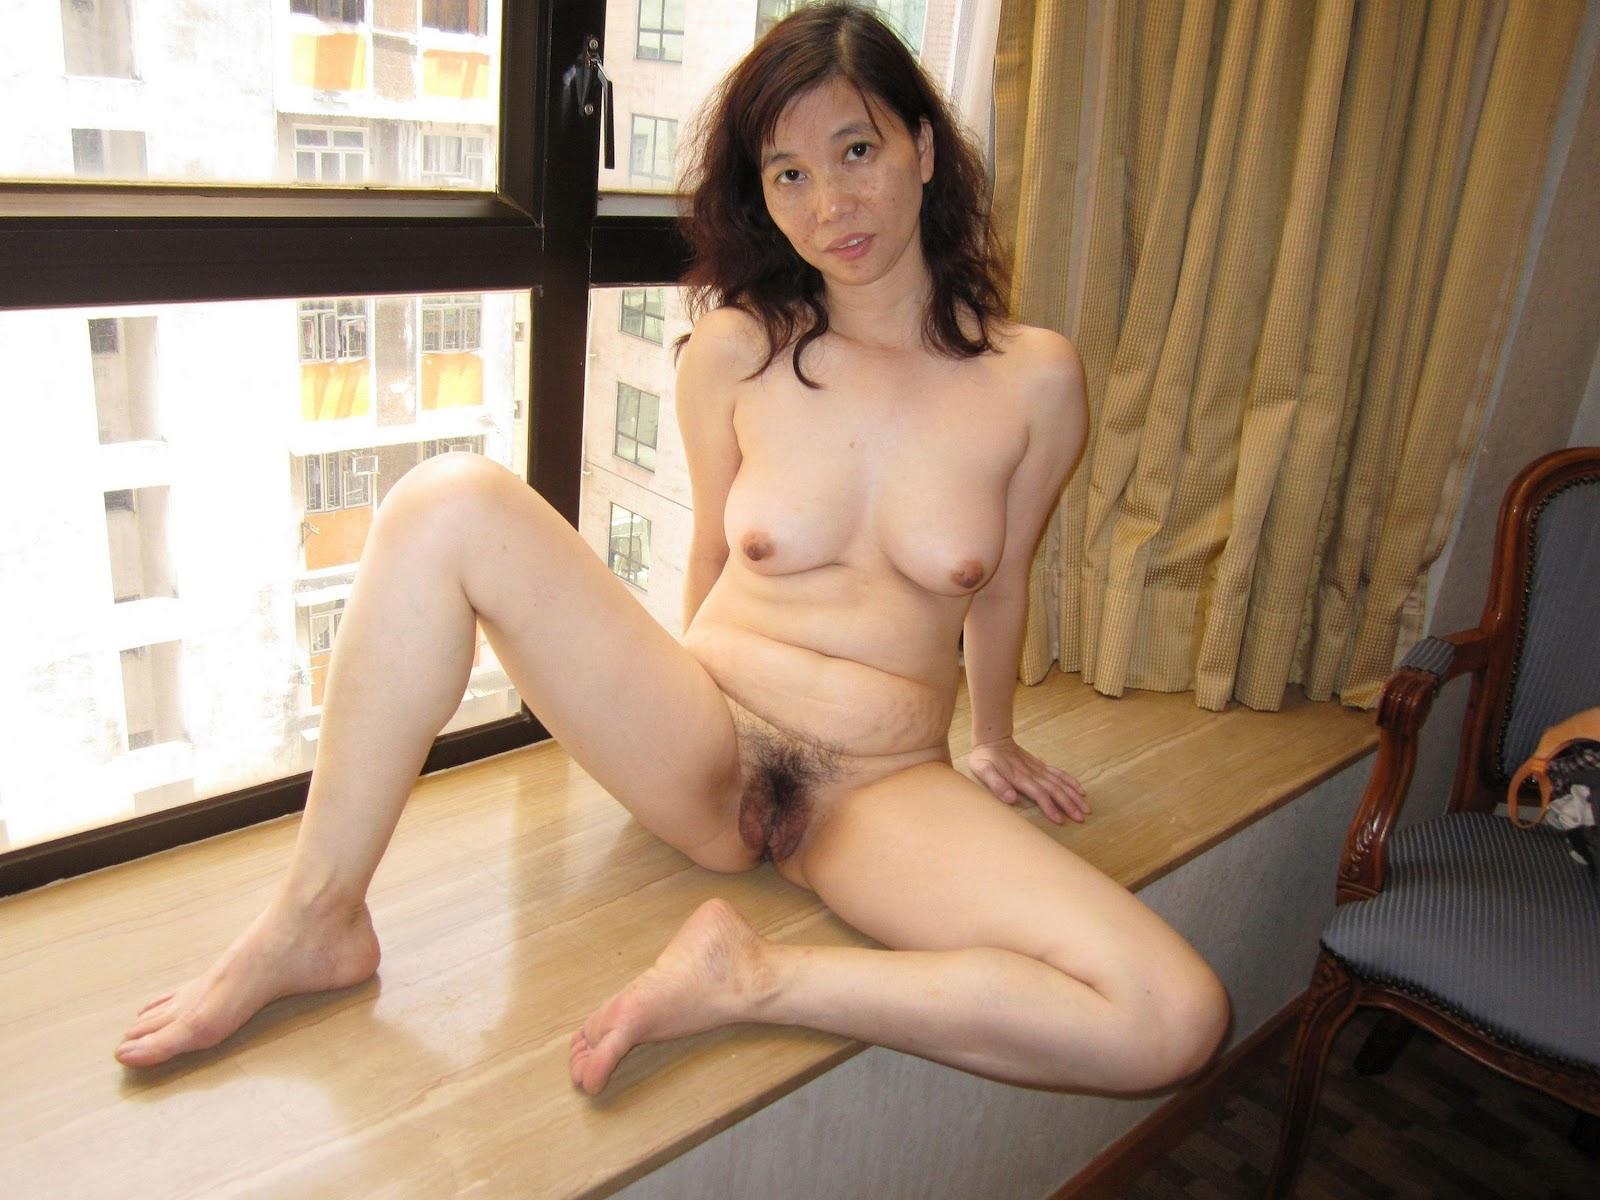 Milf naked asian Free Asian